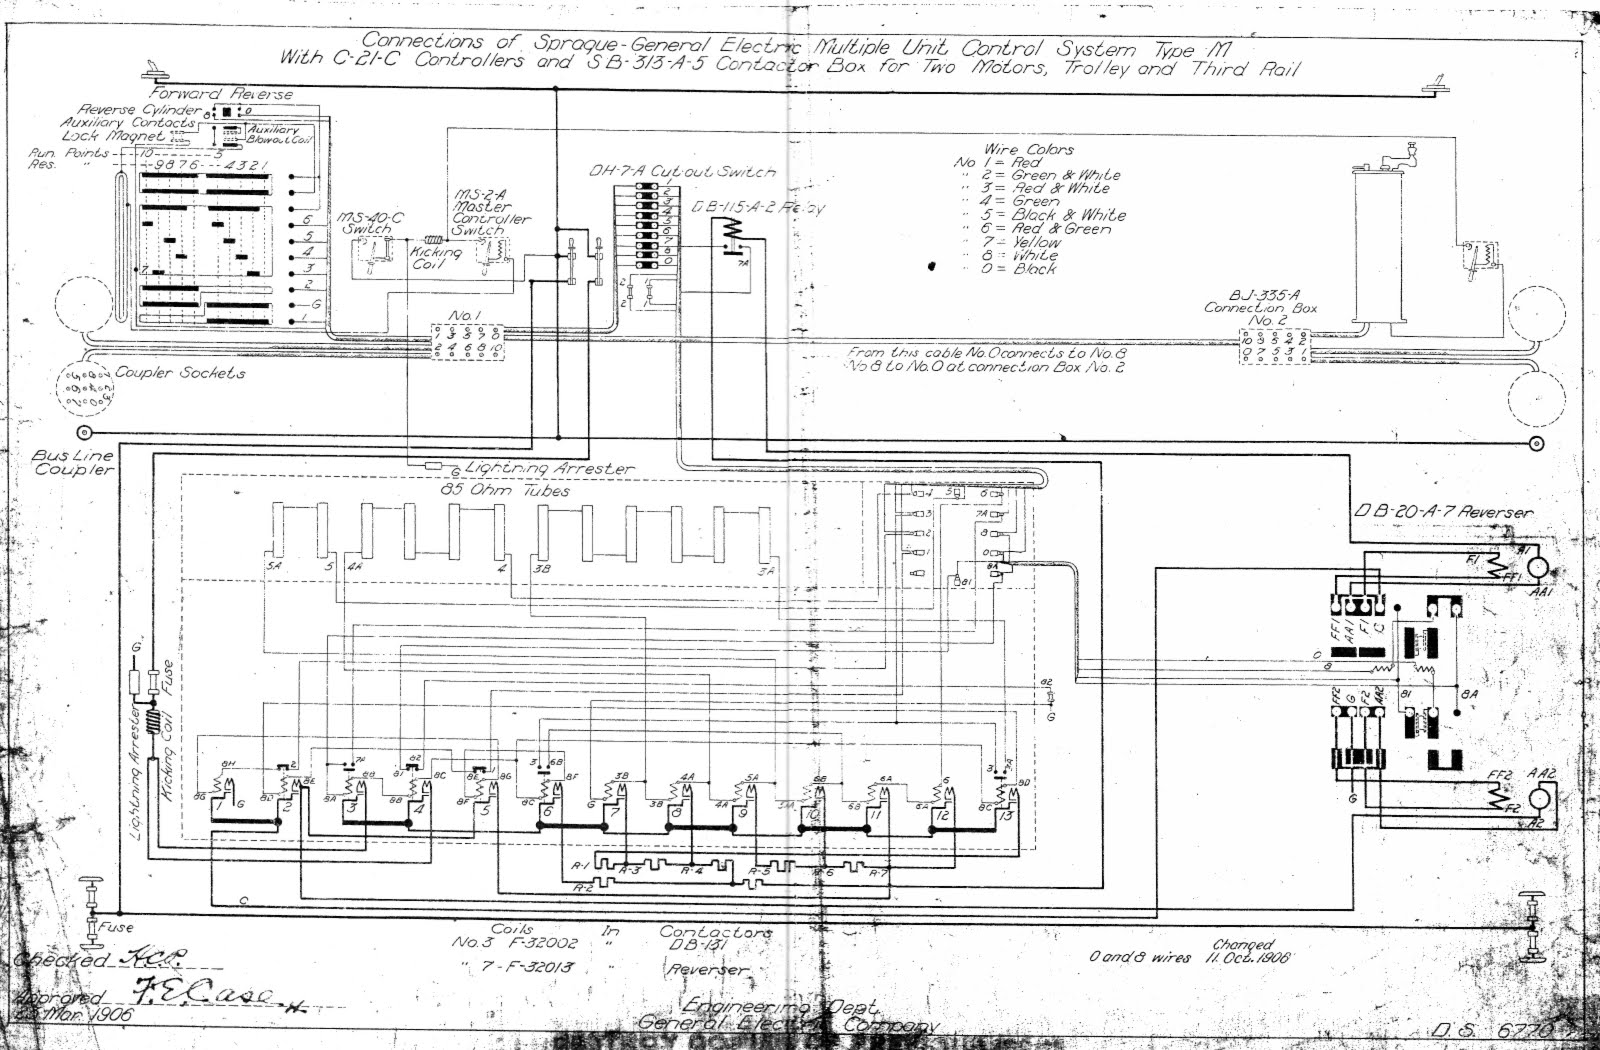 Toyota Forklift Operators Manual Pdf Wiring Diagram